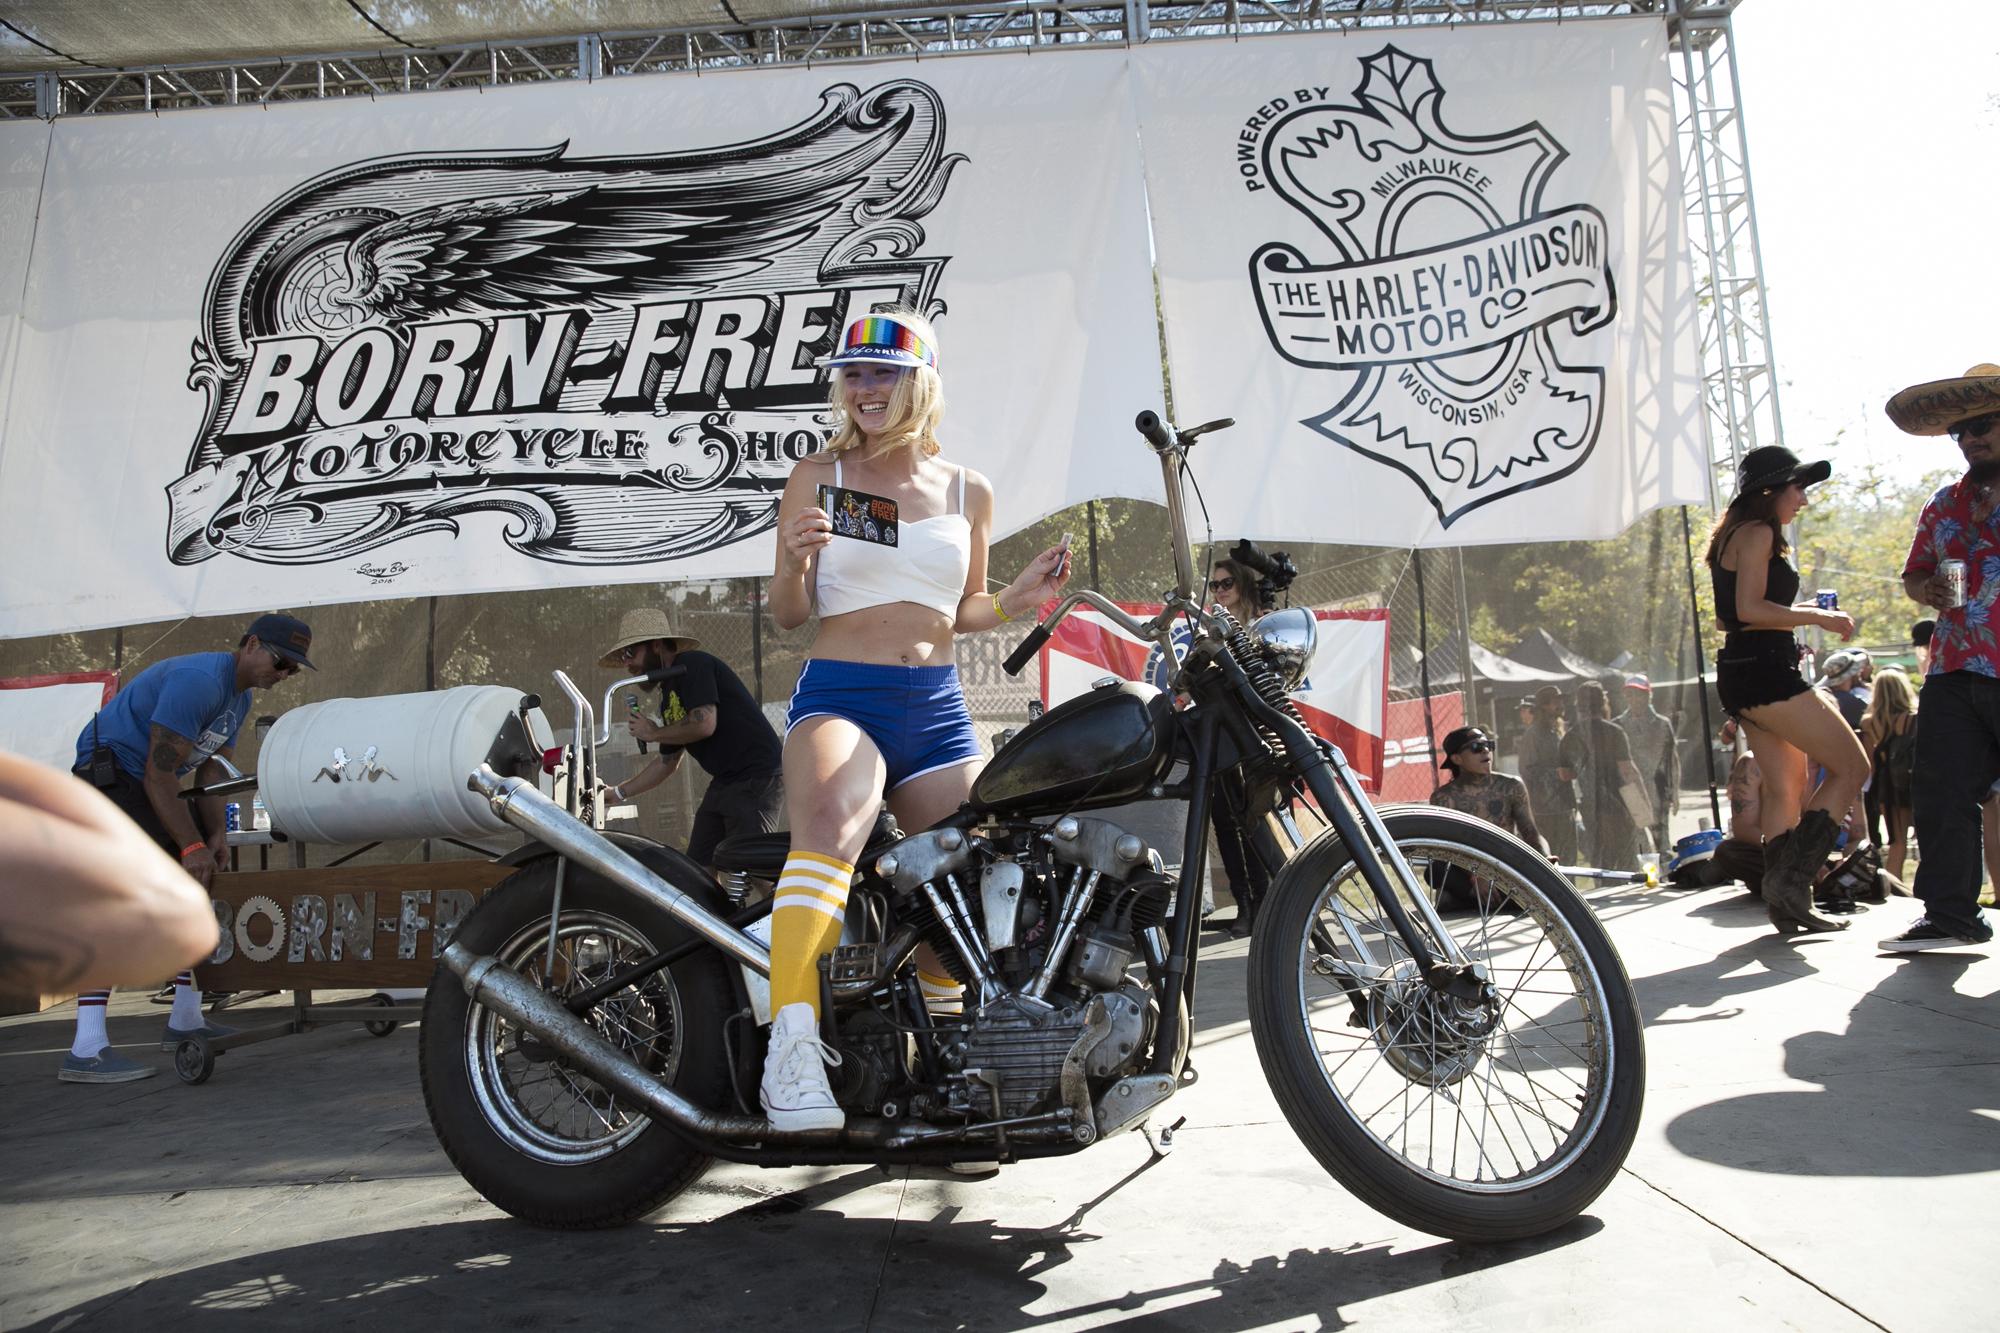 Born Free 8 Motorcycle Show-128.jpg